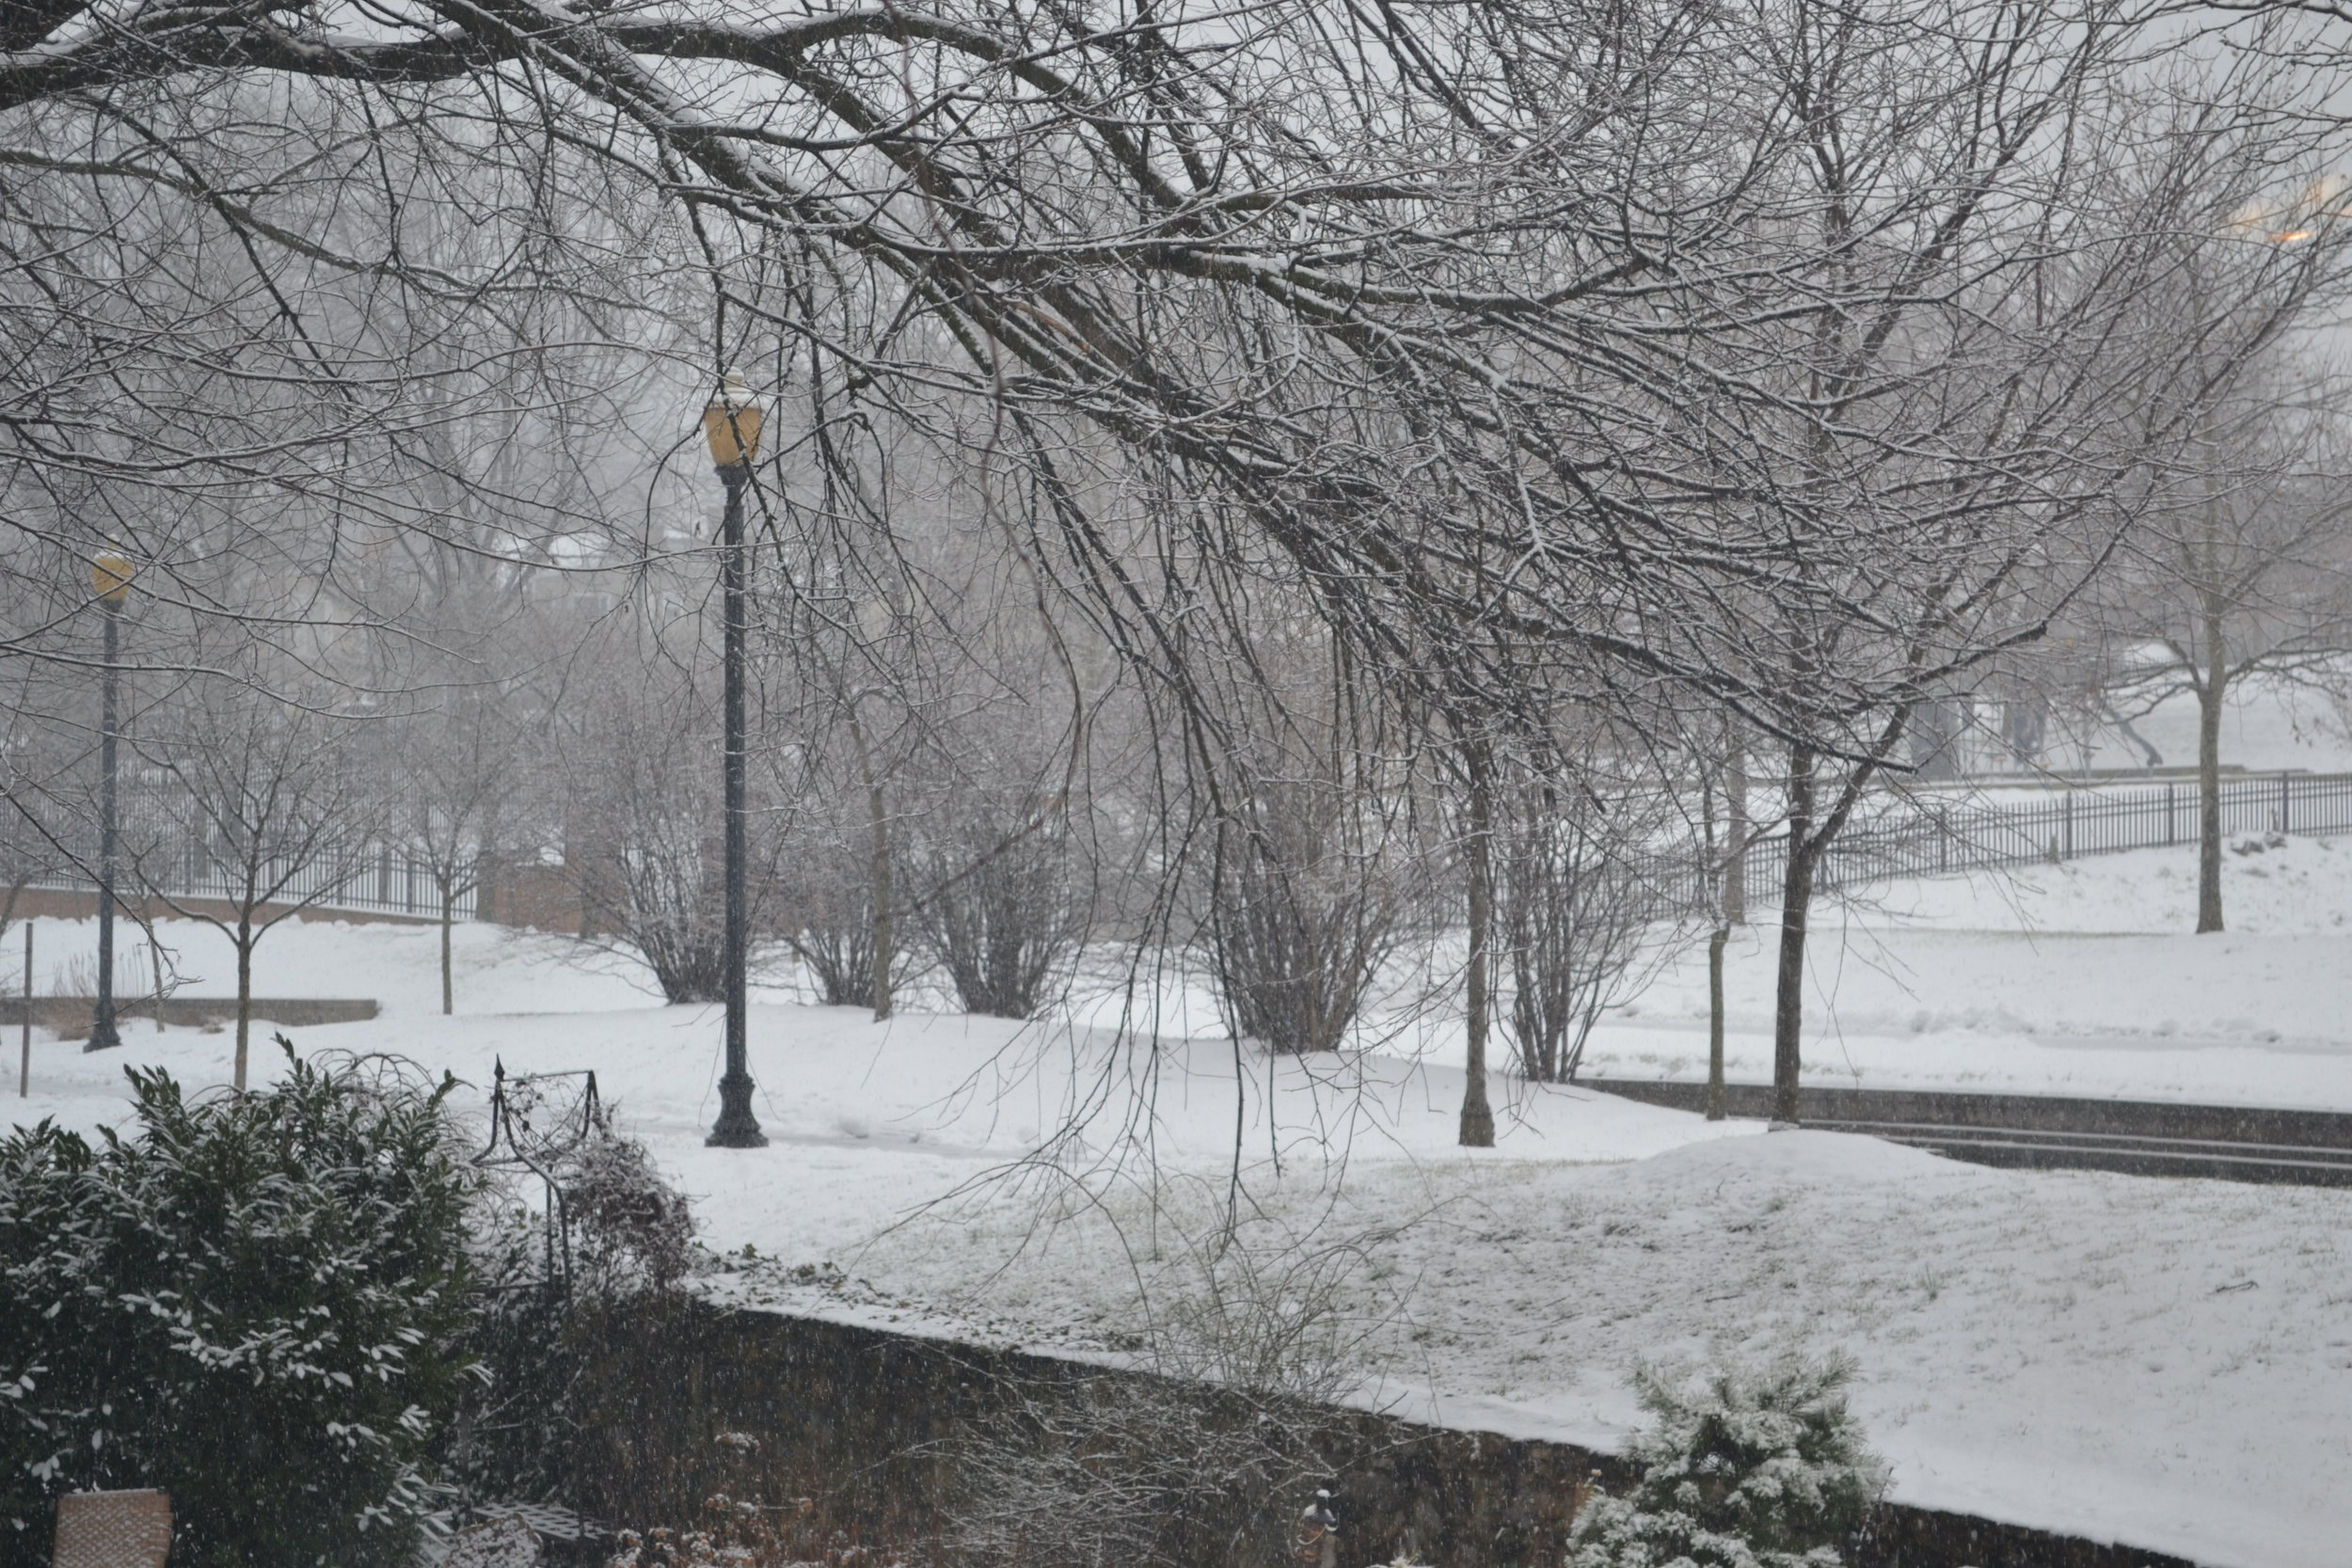 A wintery view